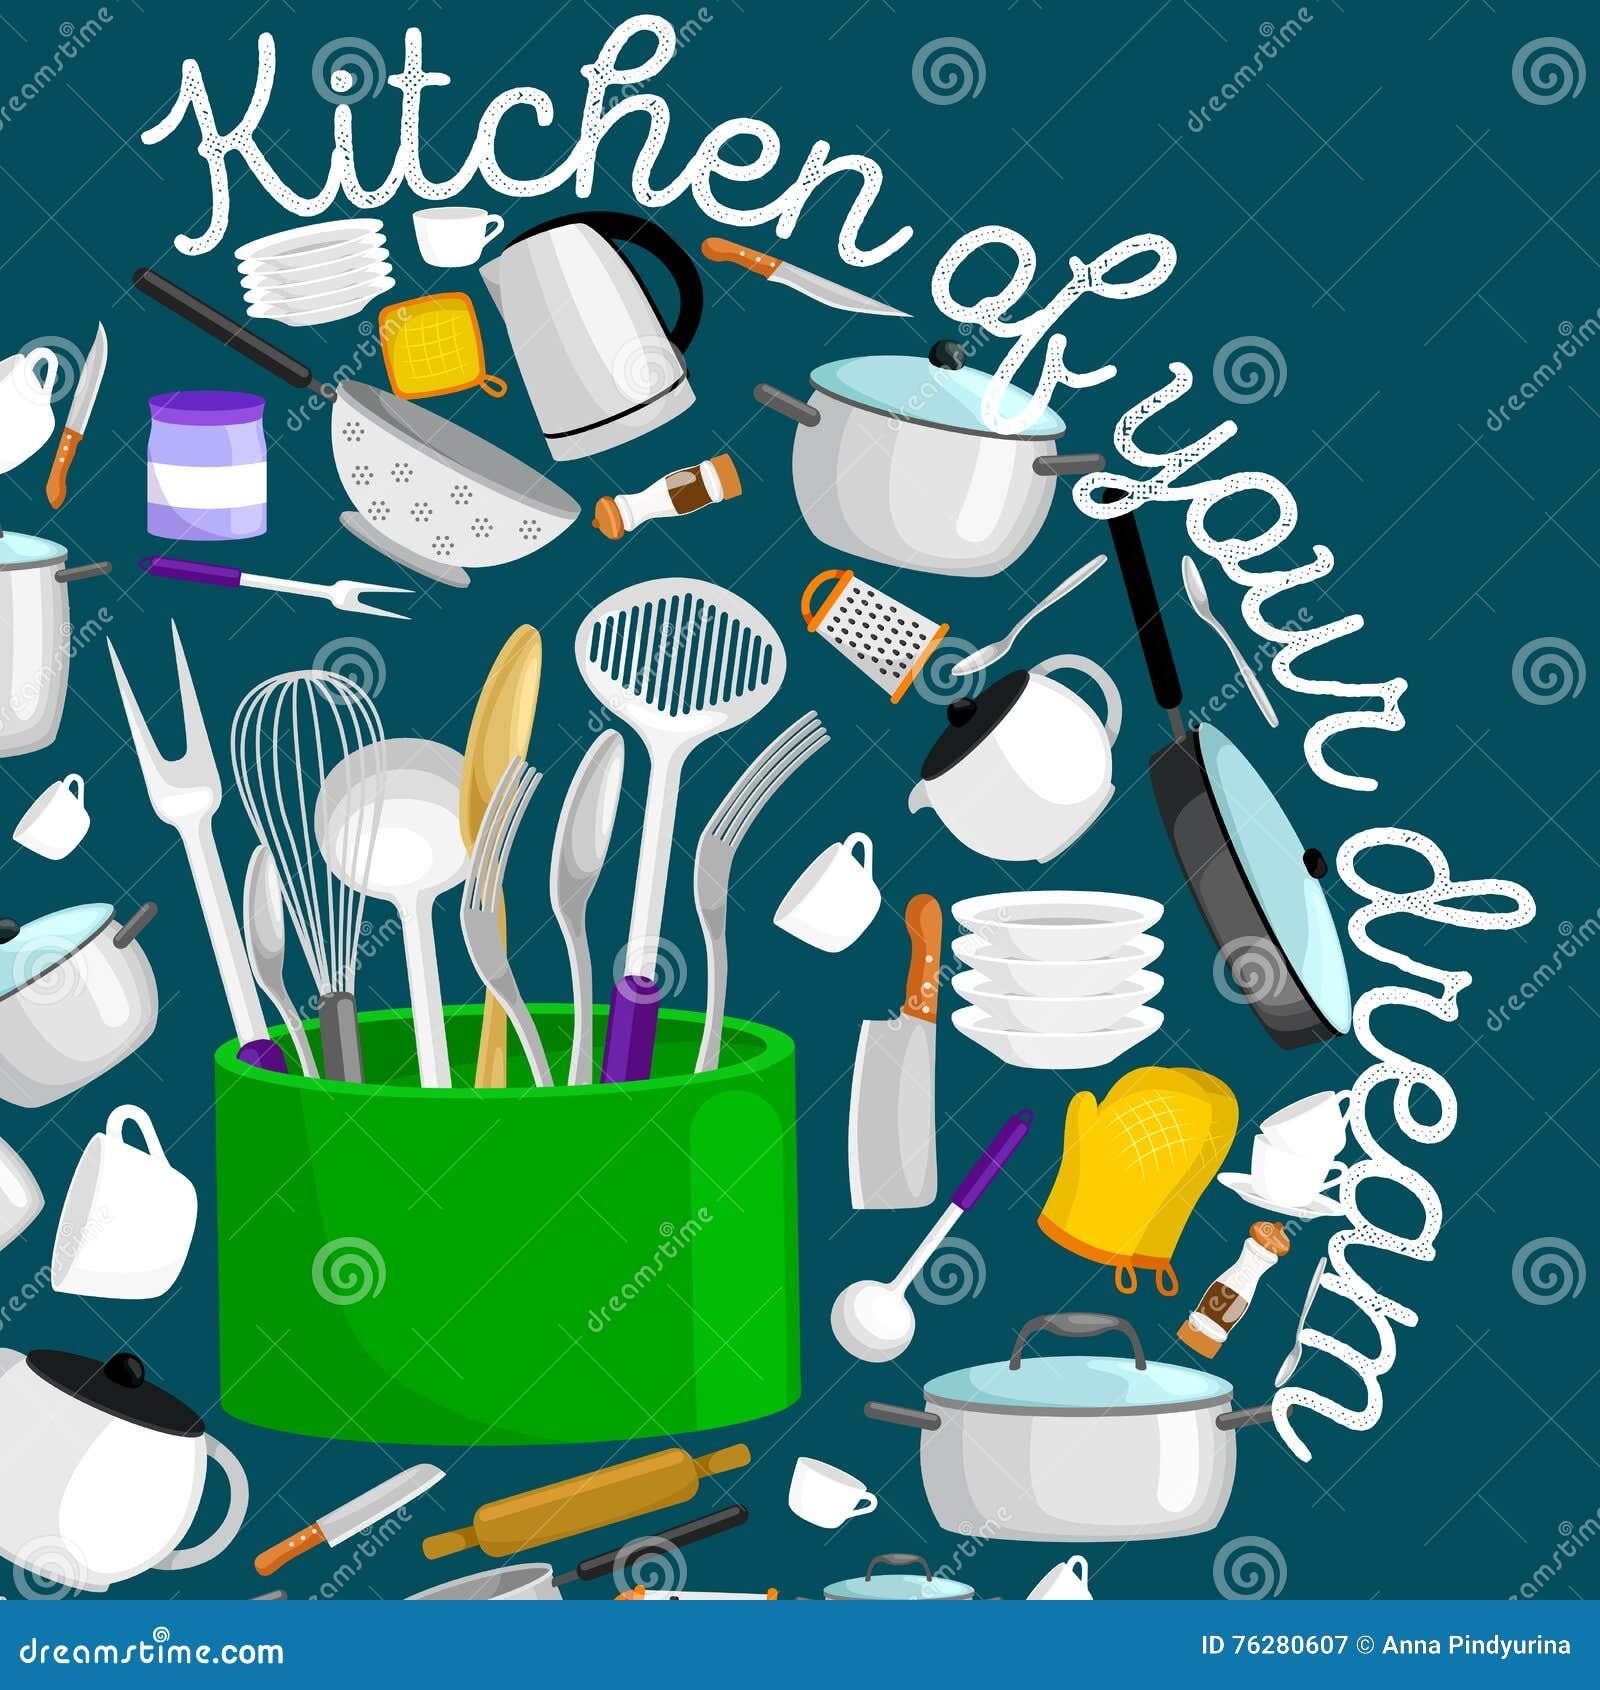 Kitchen Hob Cartoon ~ Kitchenware icons vector set rtoon kitchen utensil